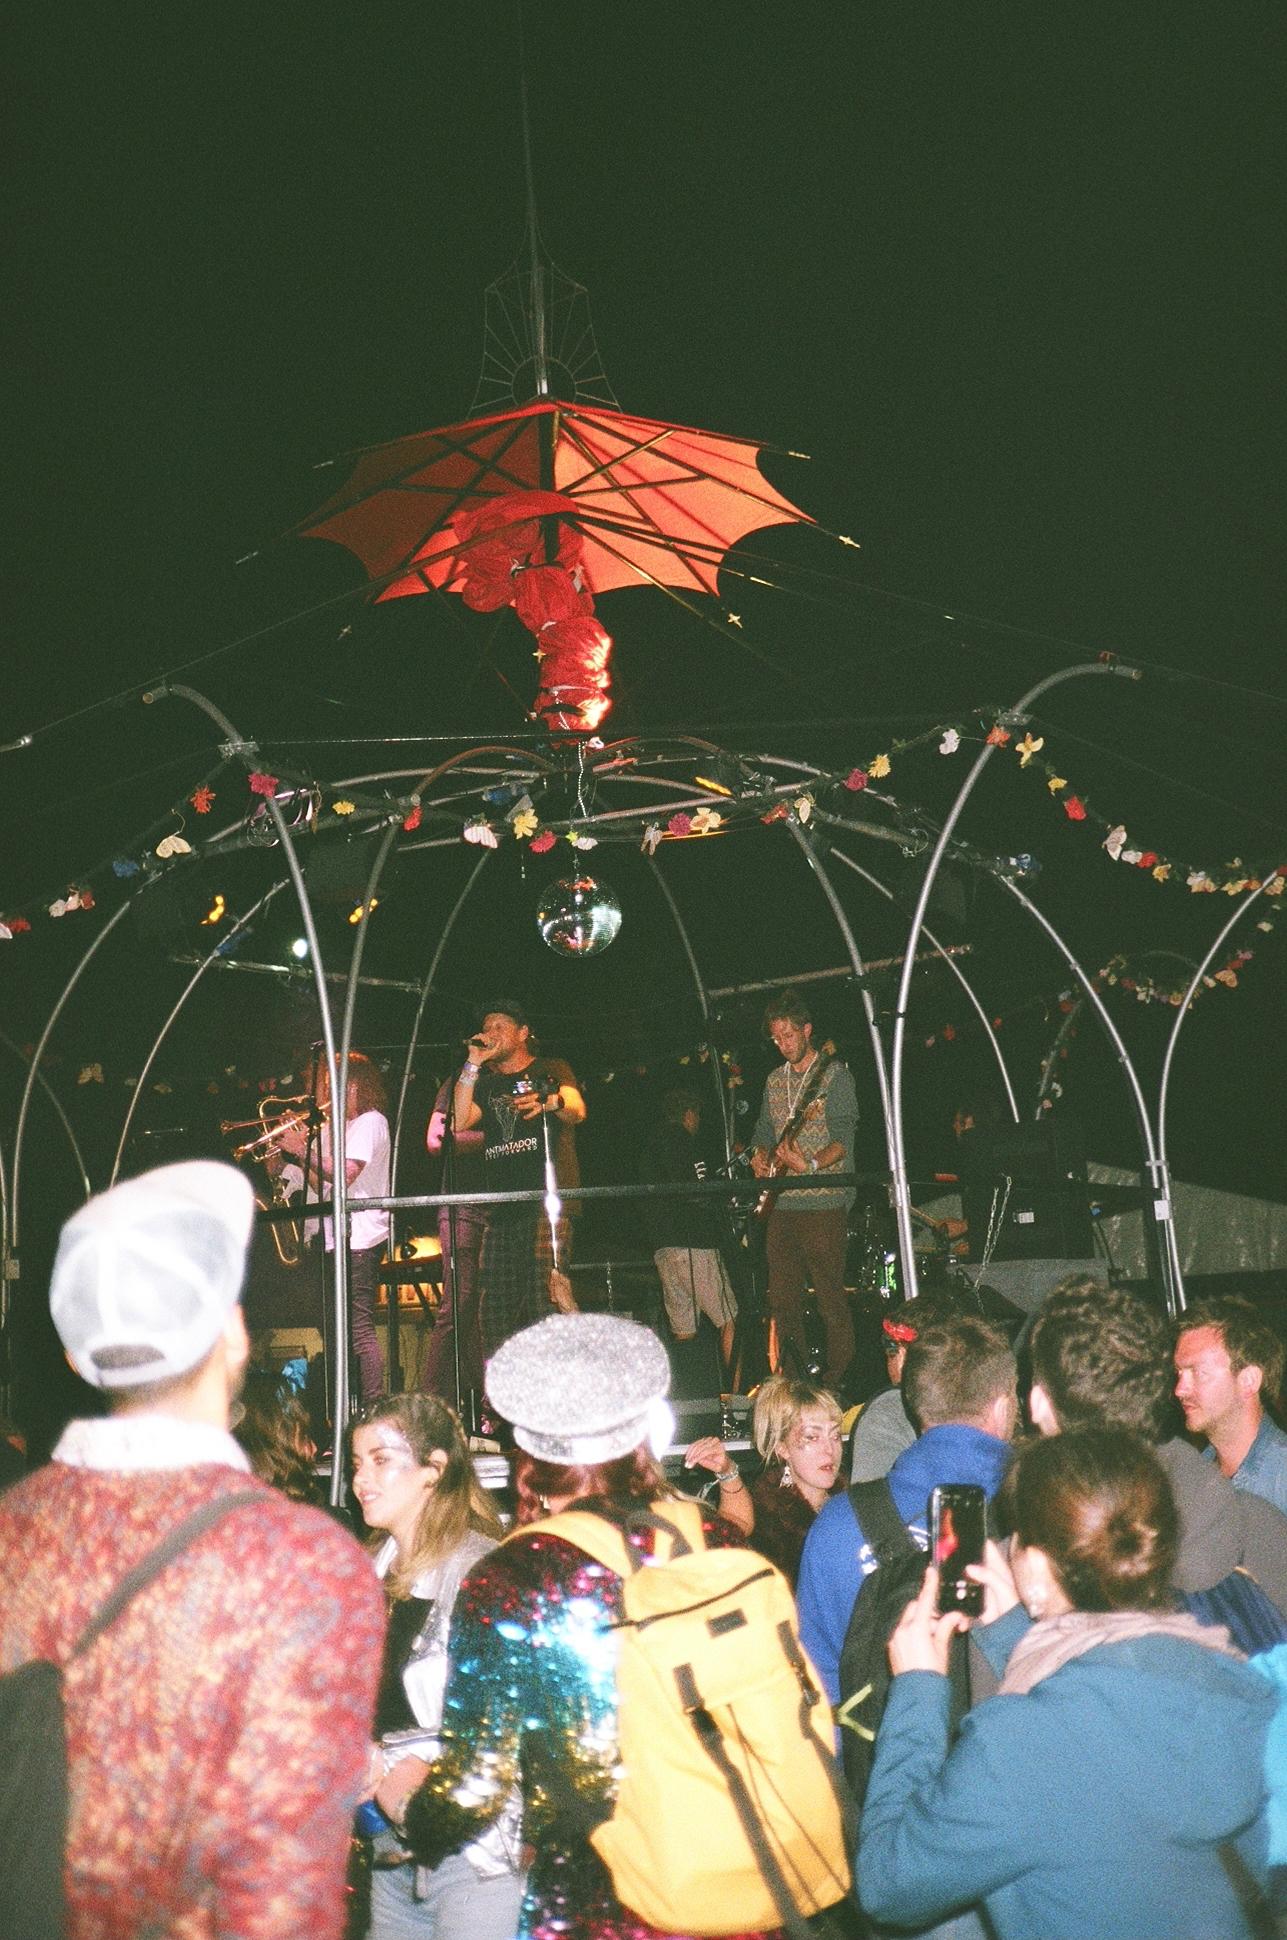 Sunday night jazz set in William's Green